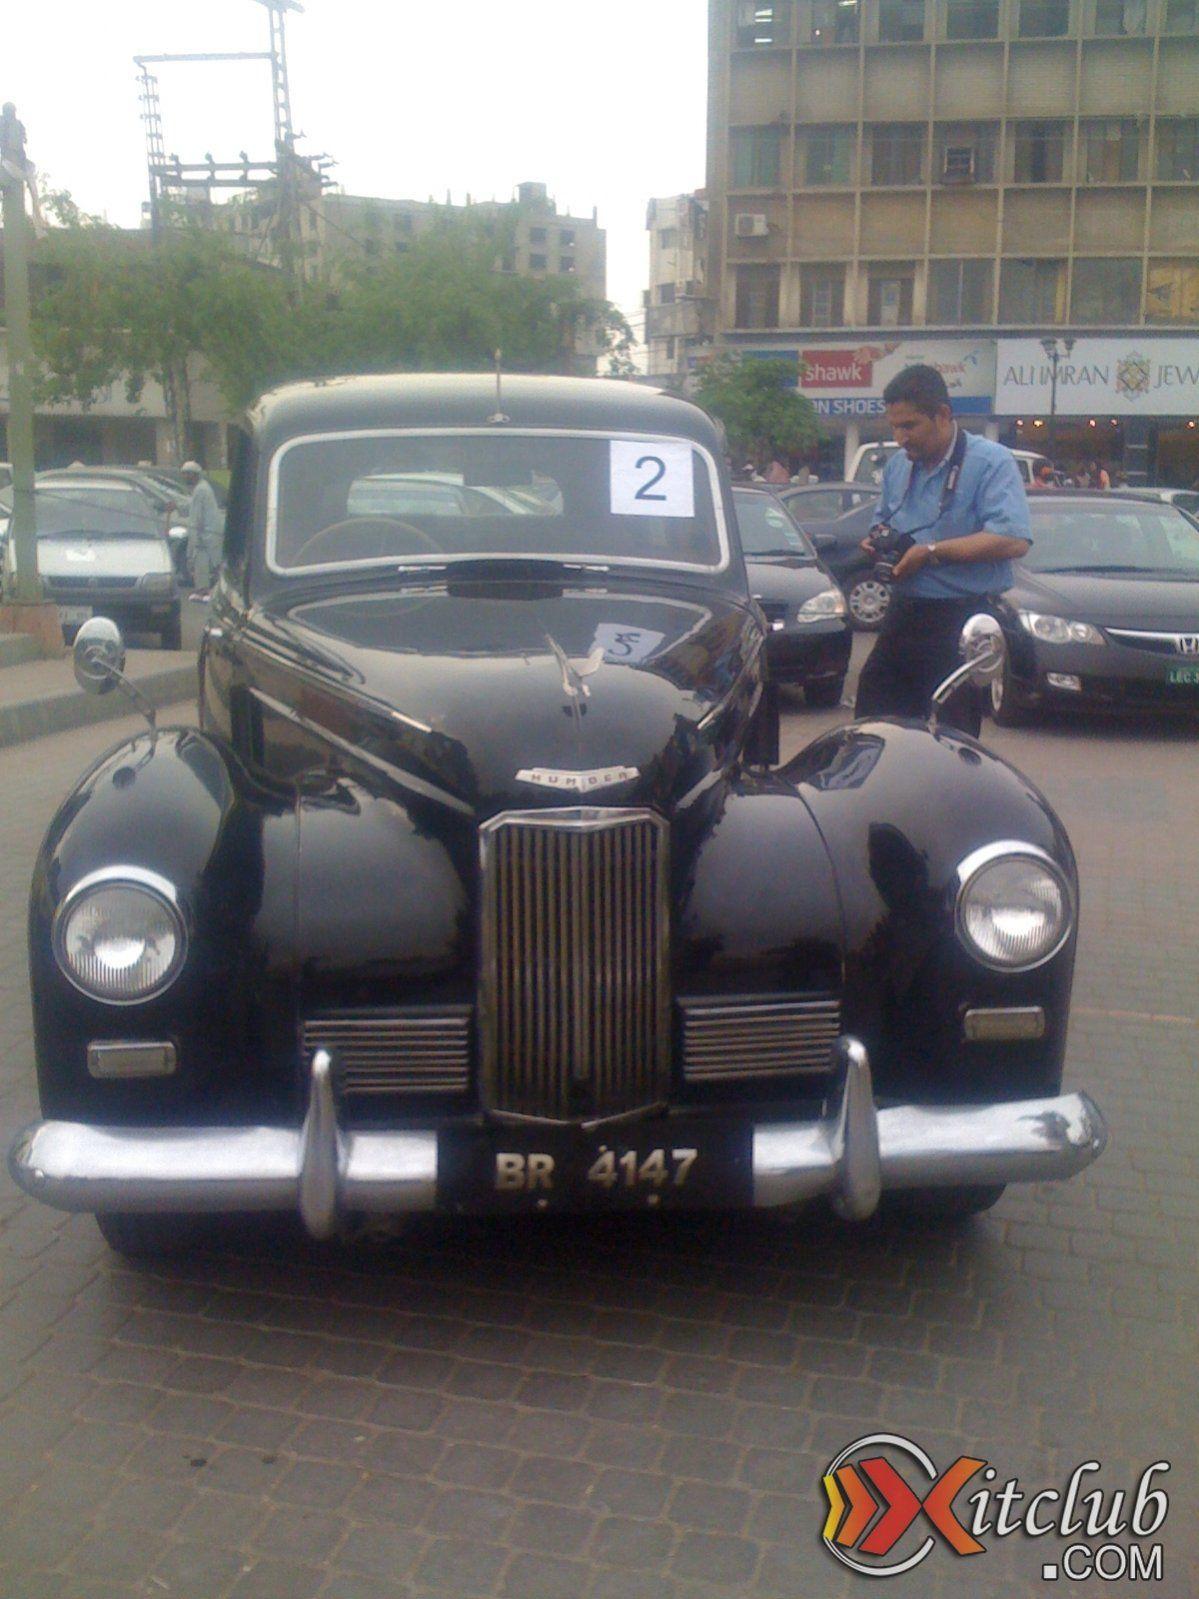 Old Car Collection Car 2 Vintage Oldies I ? ?? It Pinterest